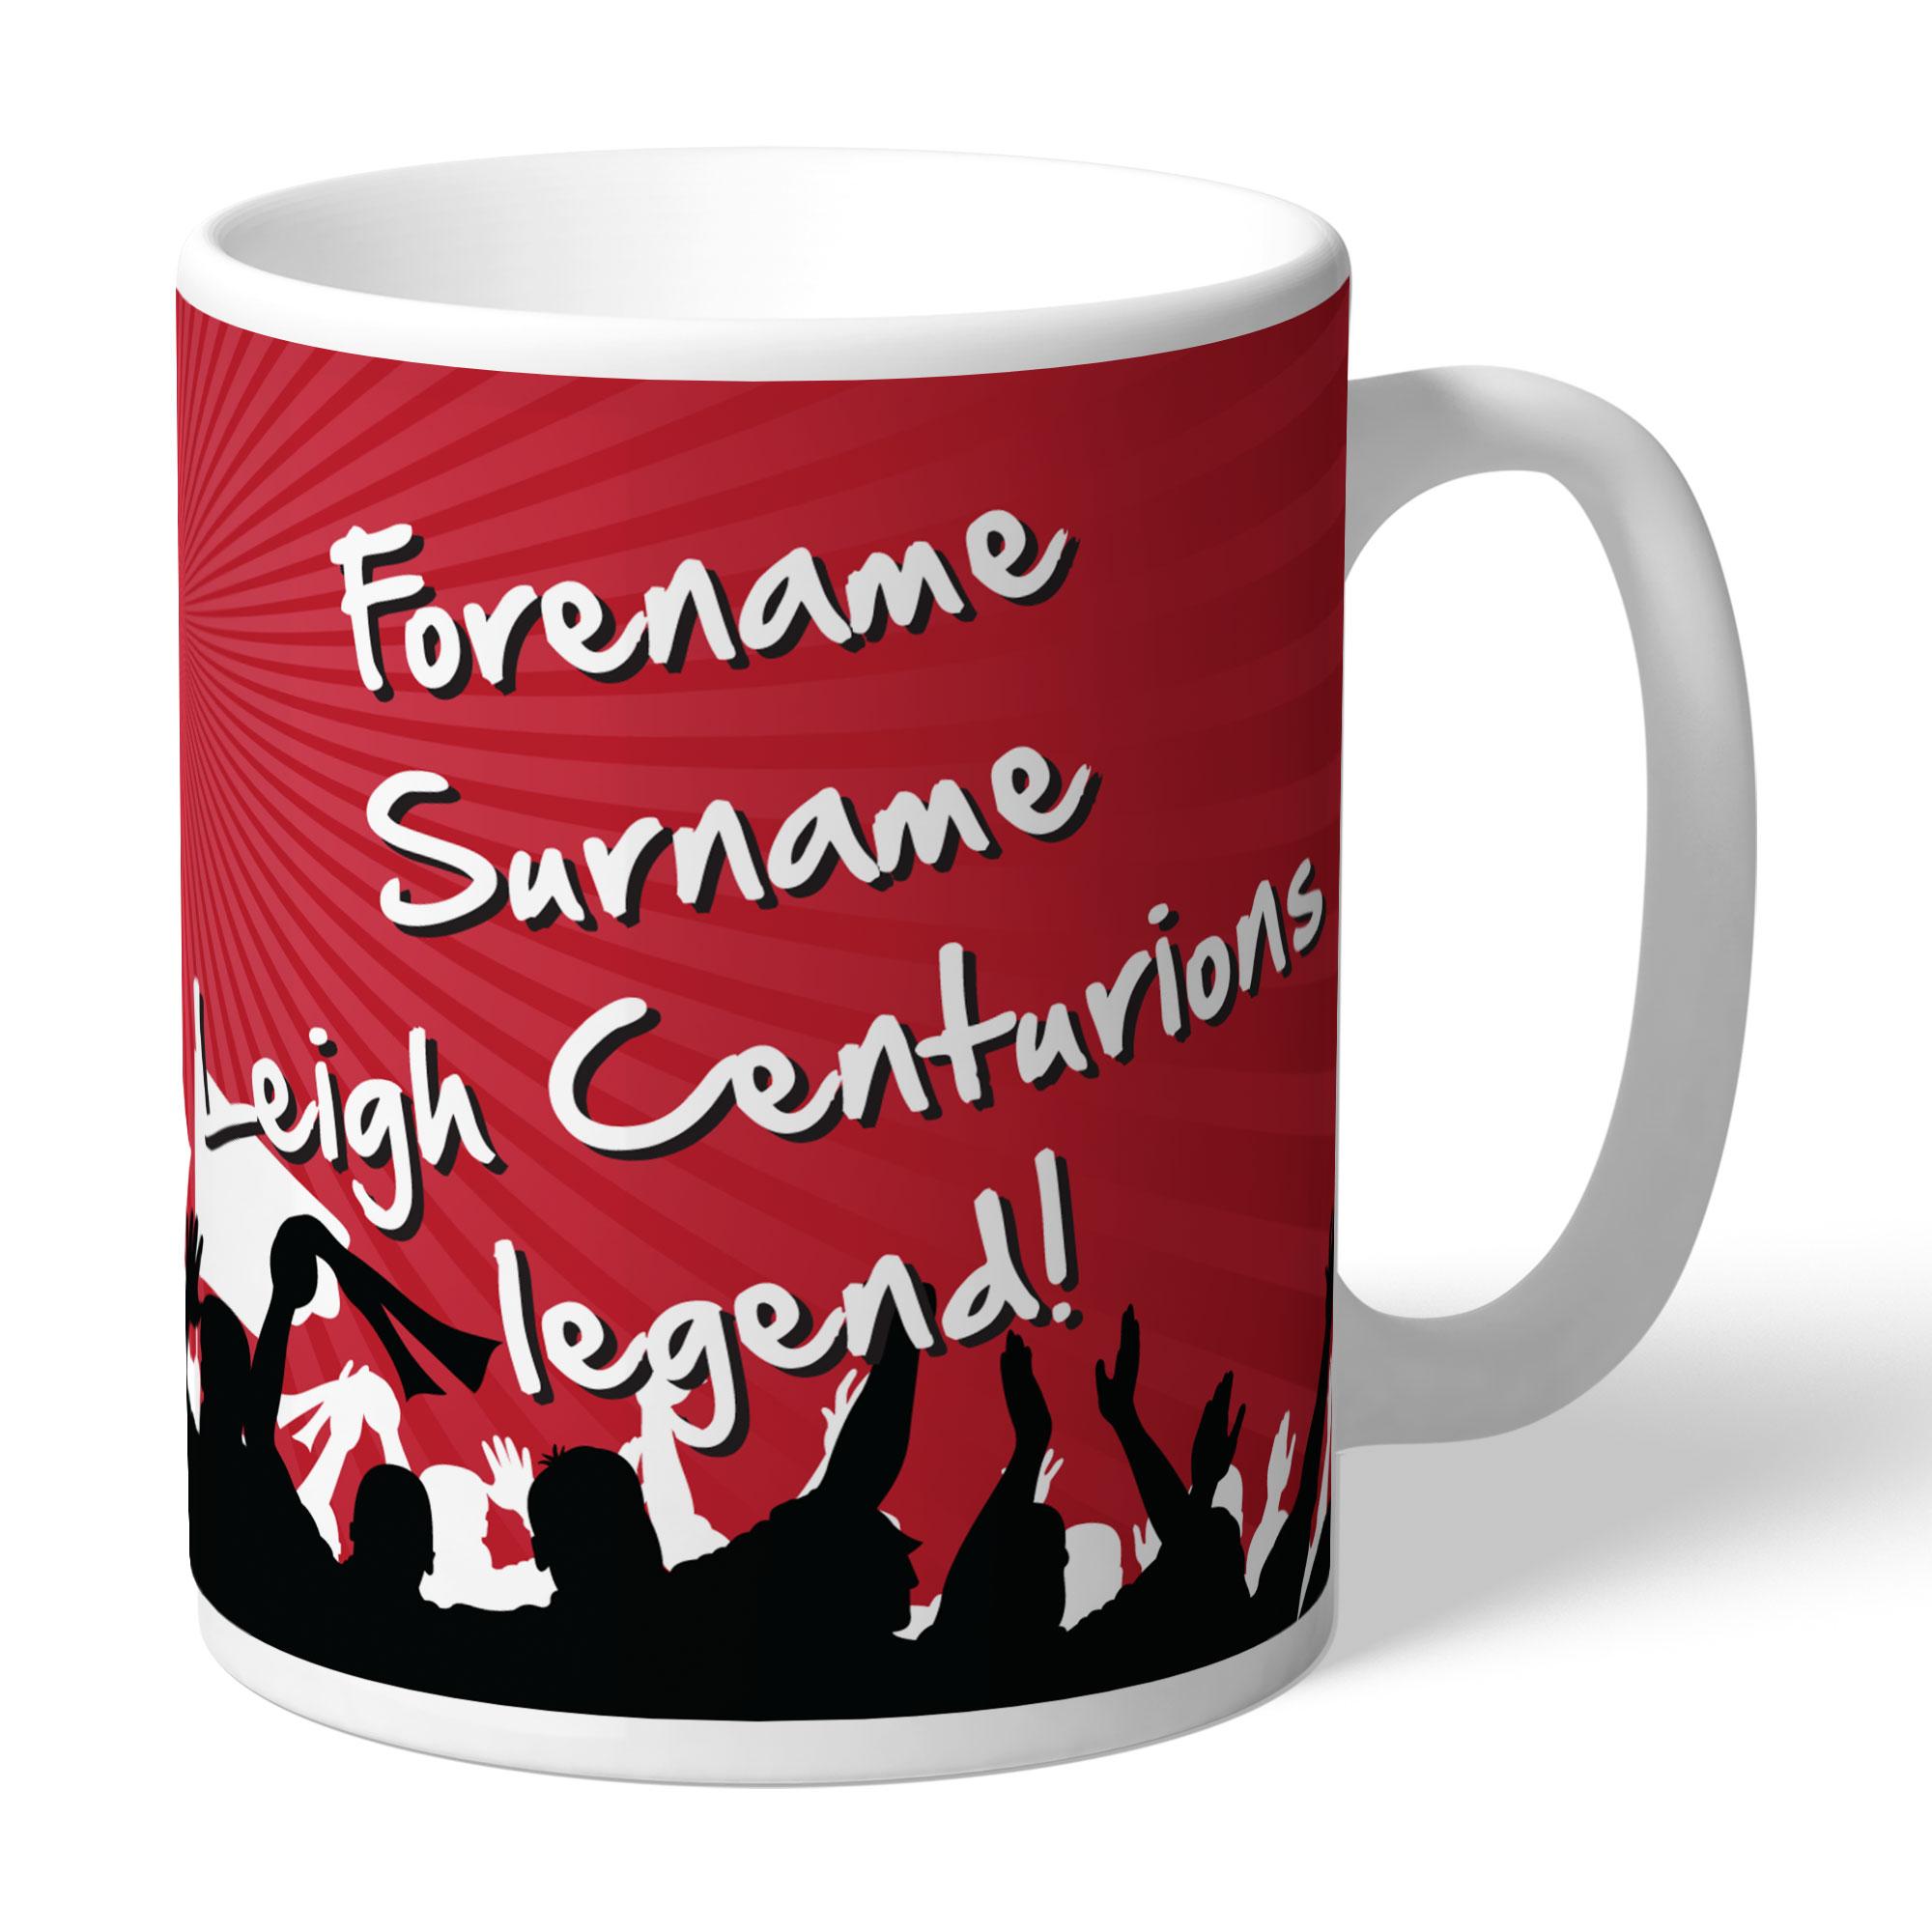 Leigh Centurions Legend Mug